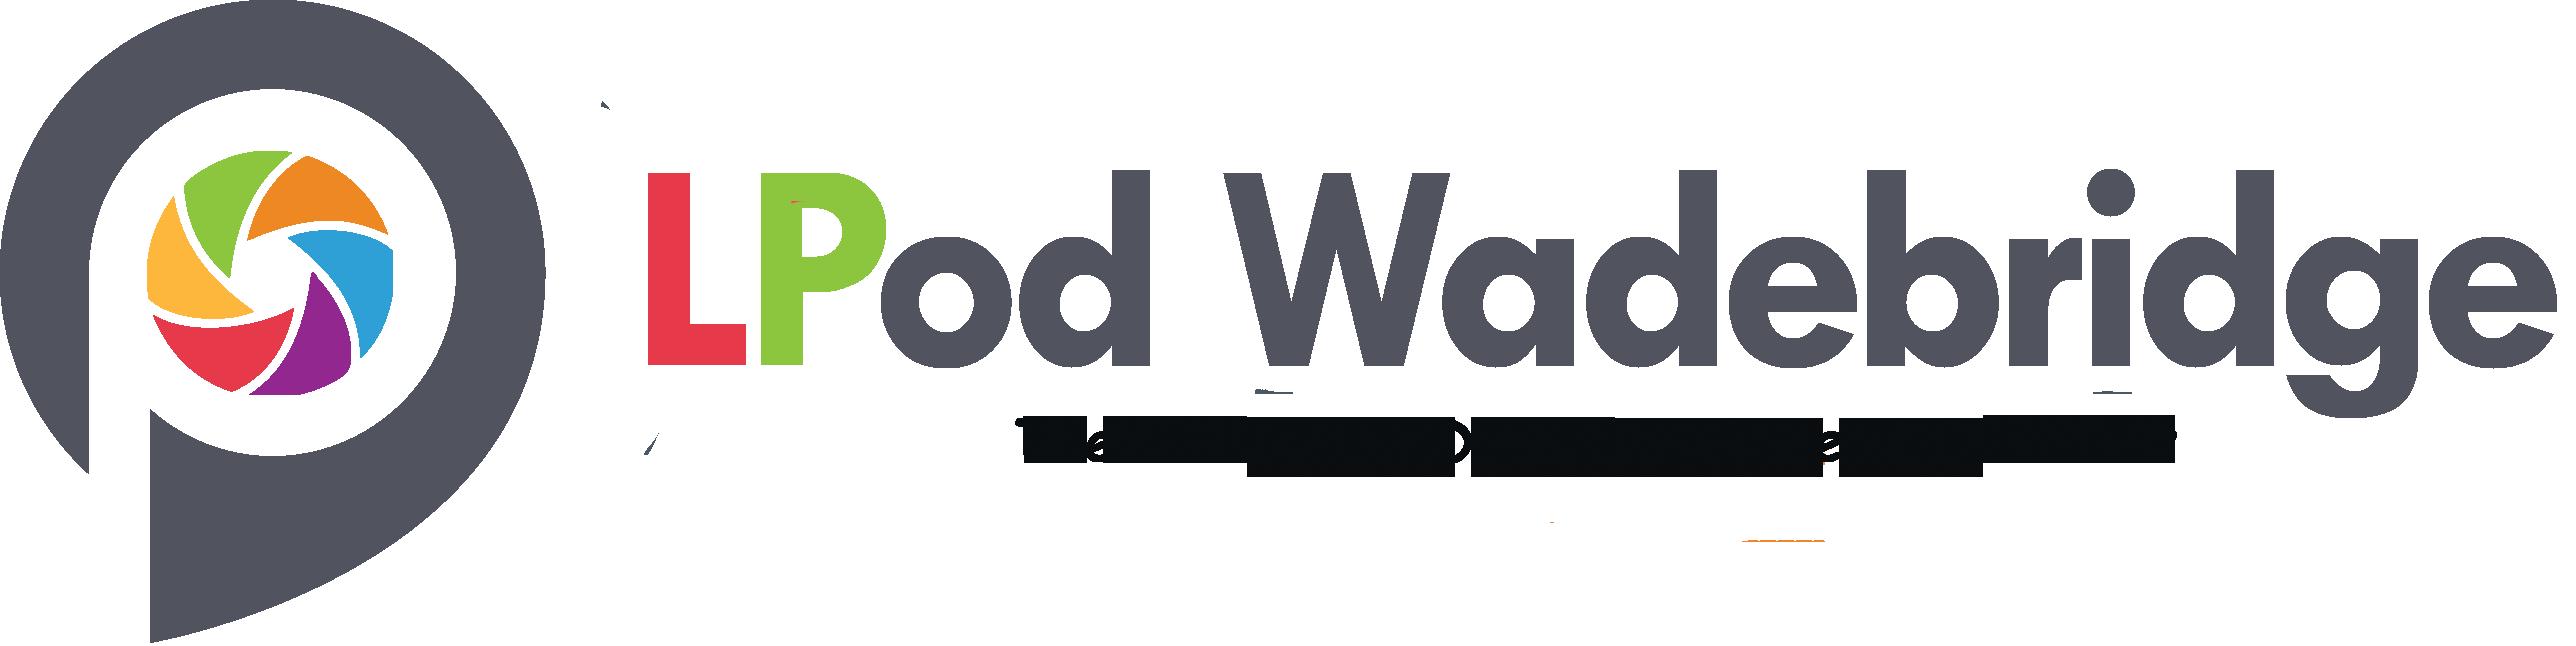 intensive driving courses wadebridge. one week driving courses wadebridge, fast pass driving courses wadebridge